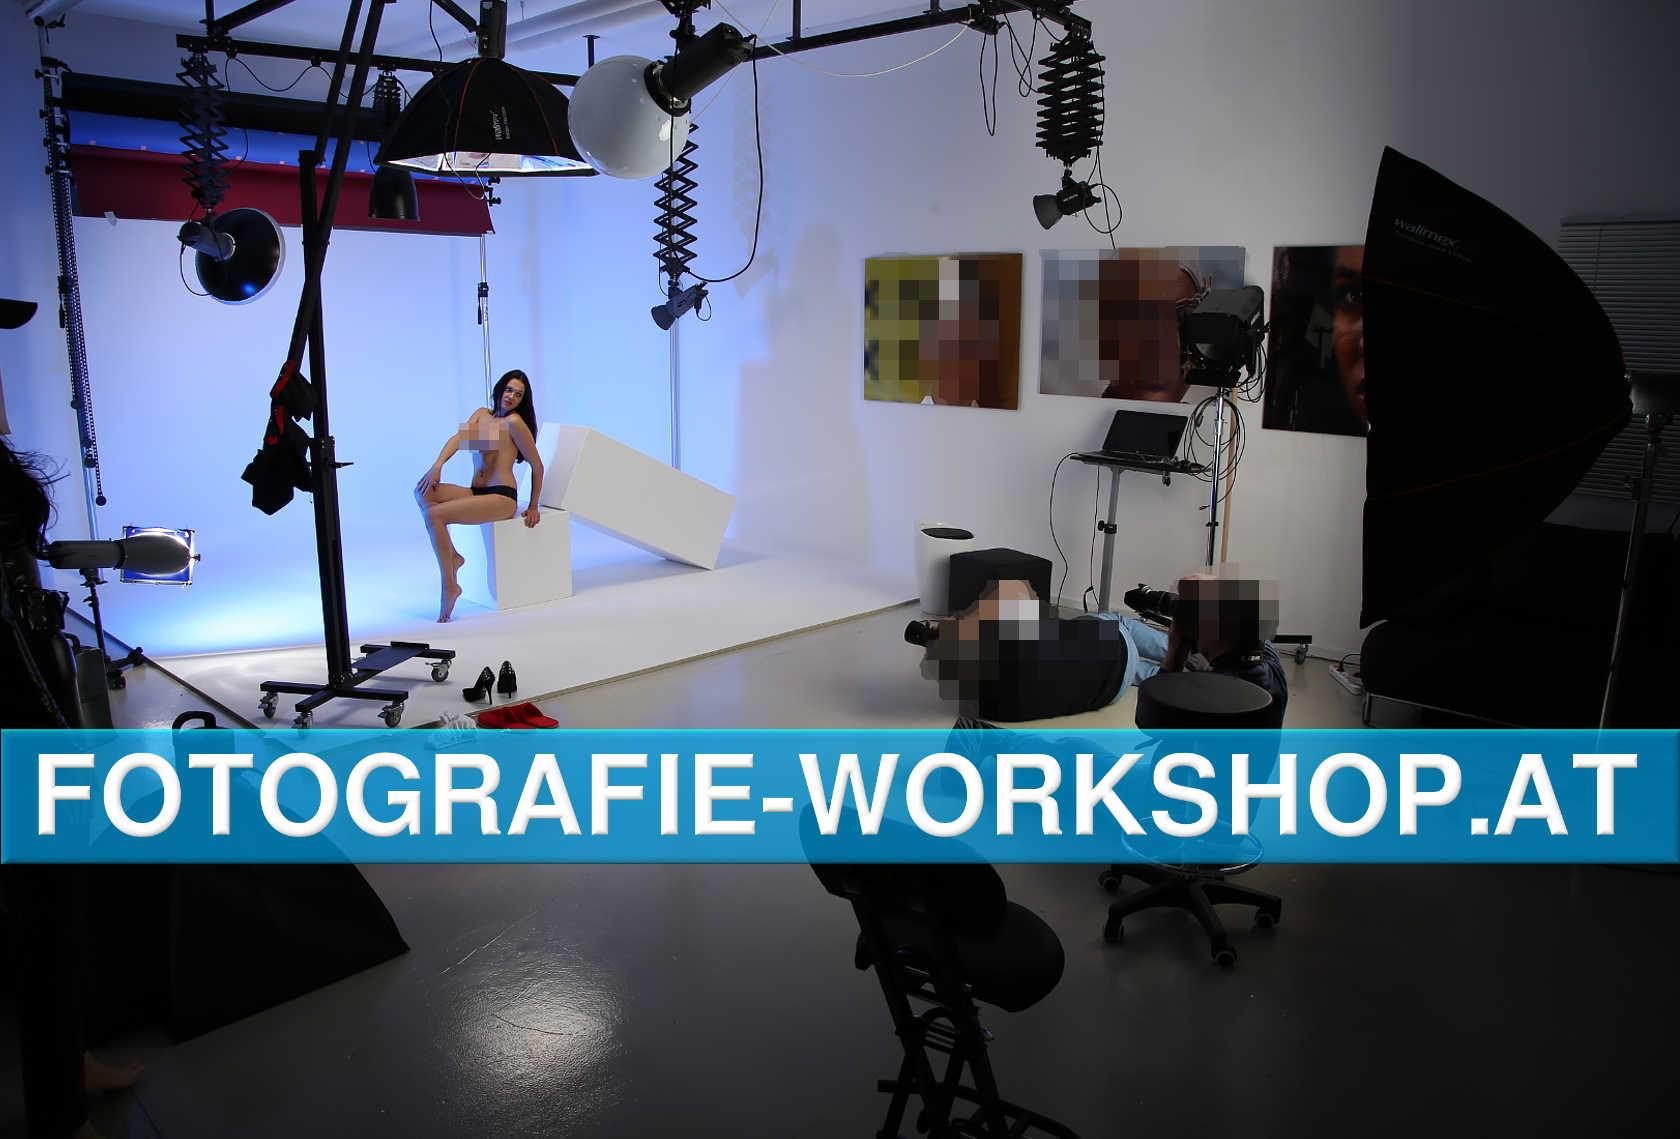 Fotografie: Workshops und Shootings im Profi Studio